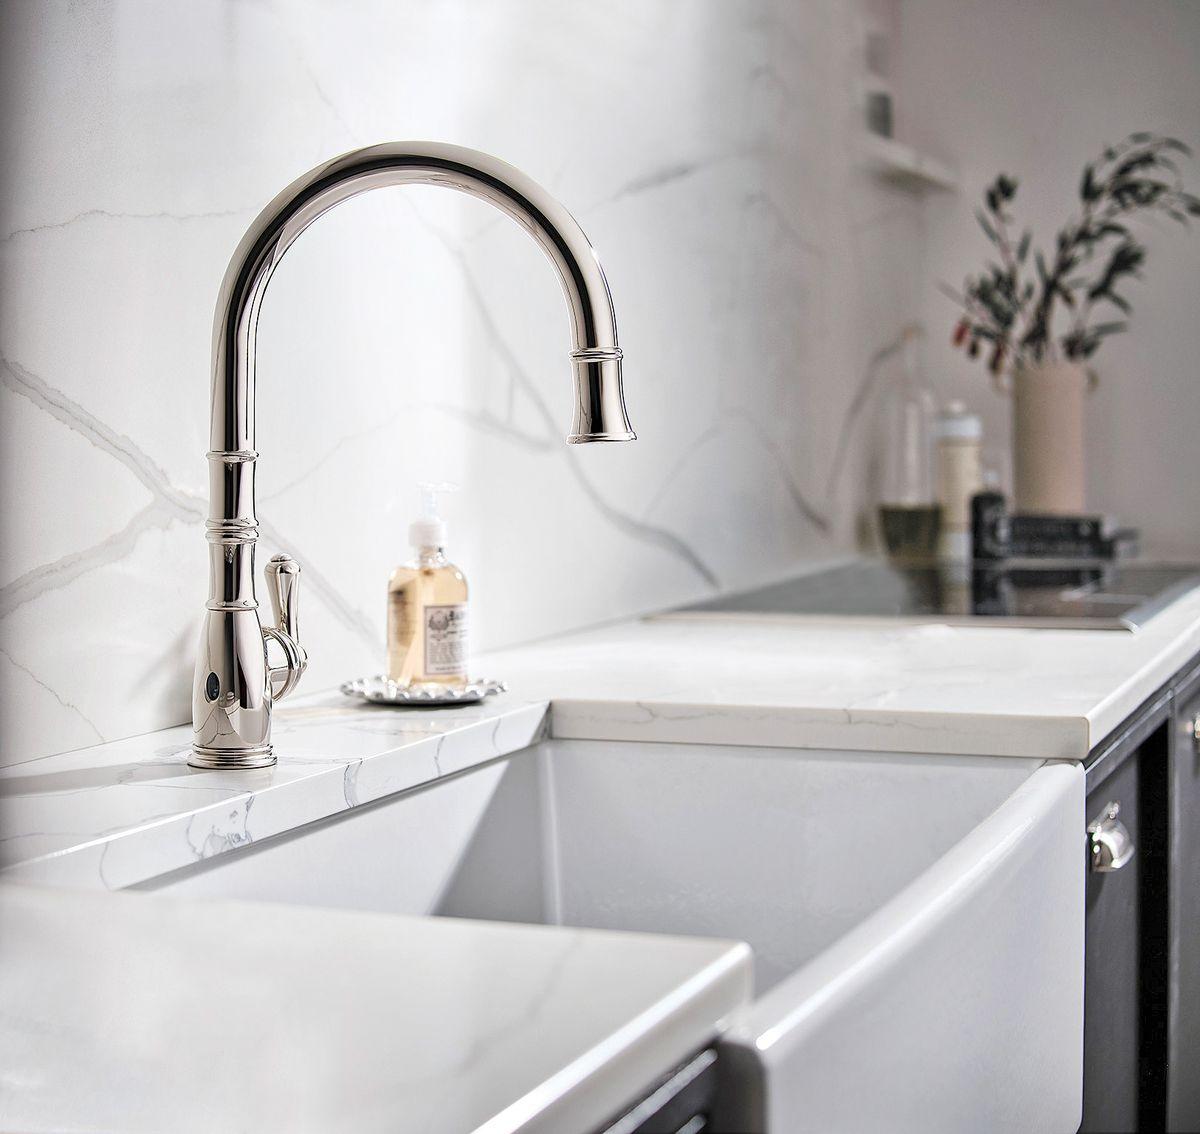 gooseneck pull-down faucet